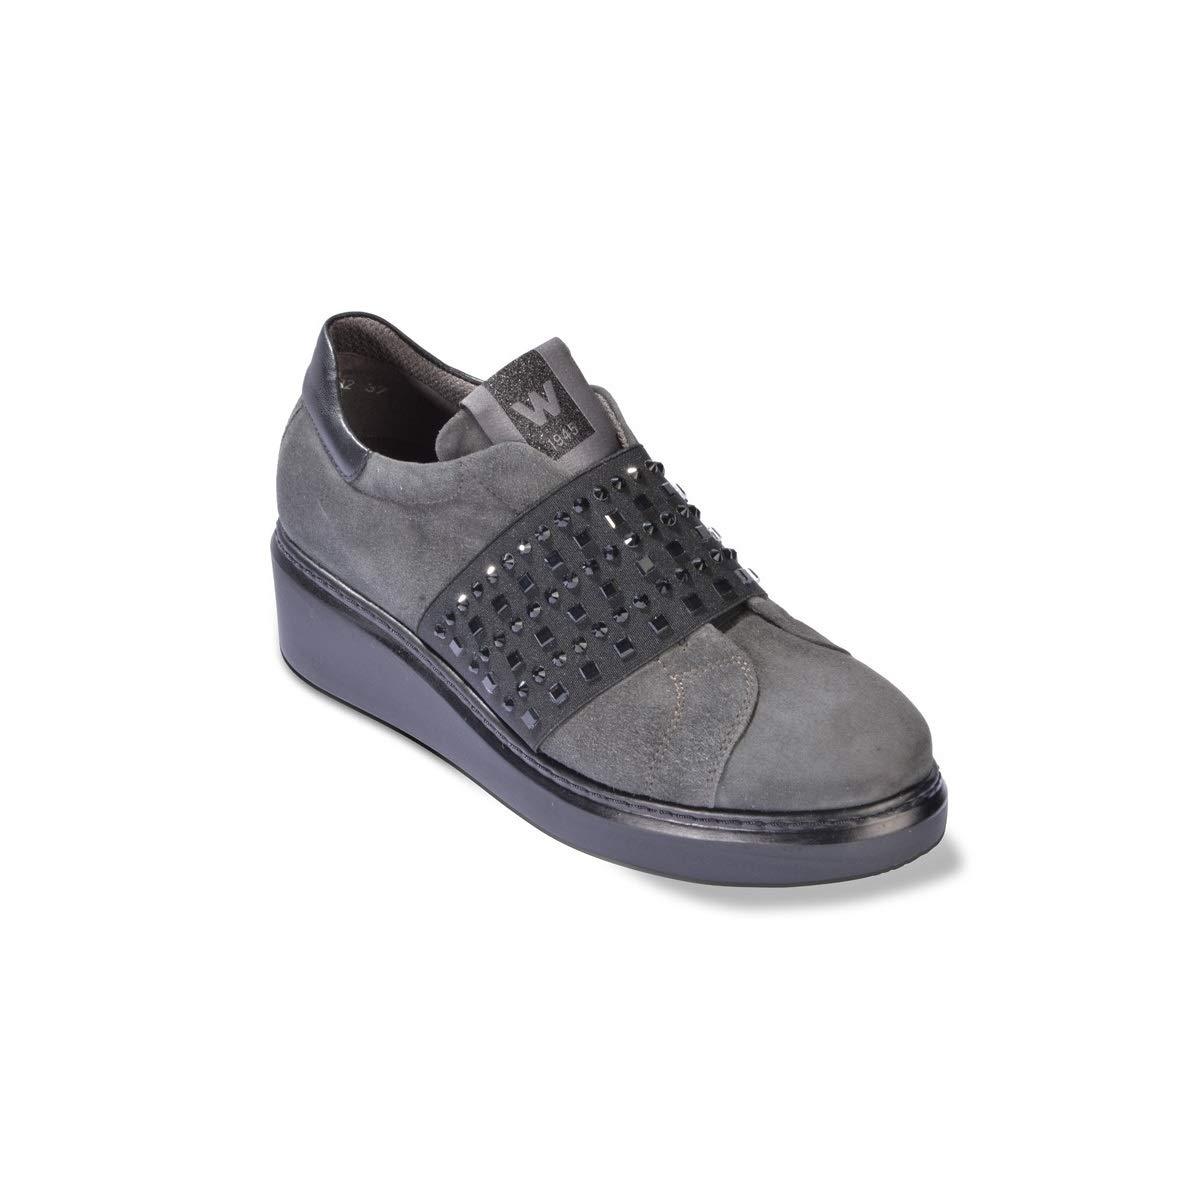 Adidas neo Ballerina Sneaker Schuhe Piona Wildleder Gr. 40